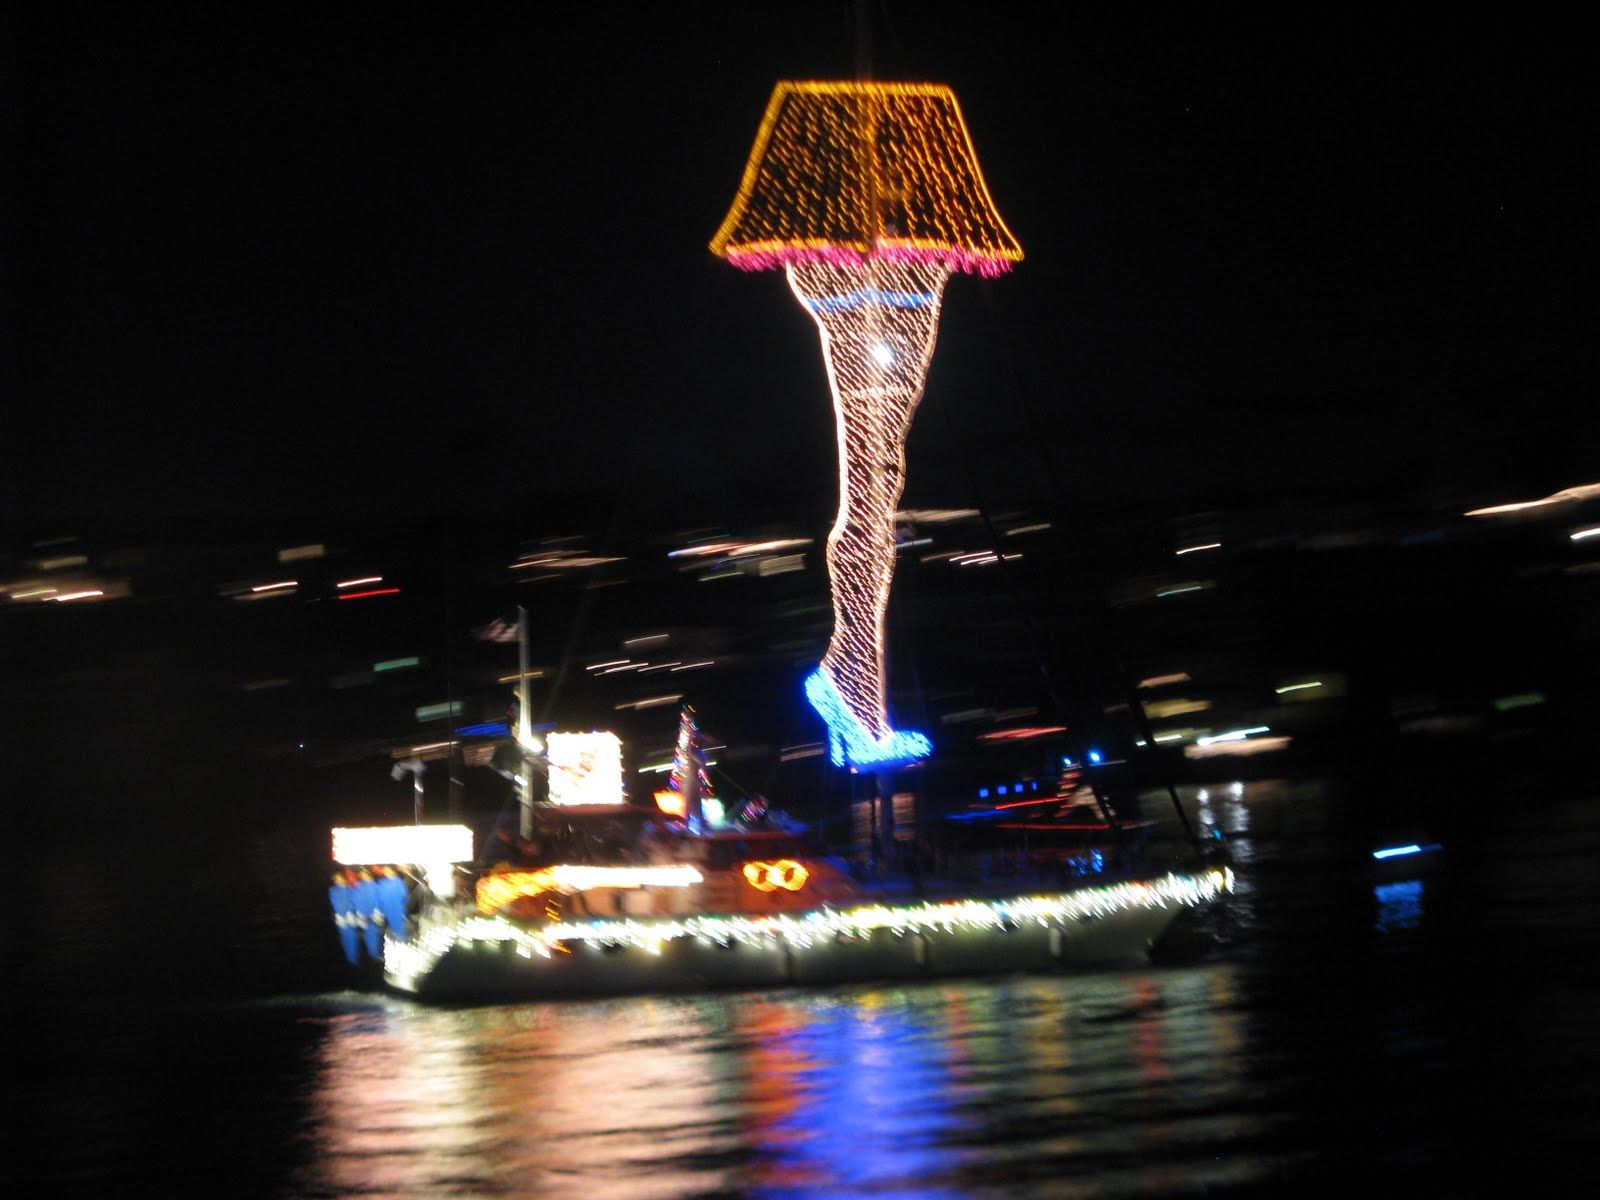 Related Image Lake Boat Parade Boat Parade Nautical Christmas